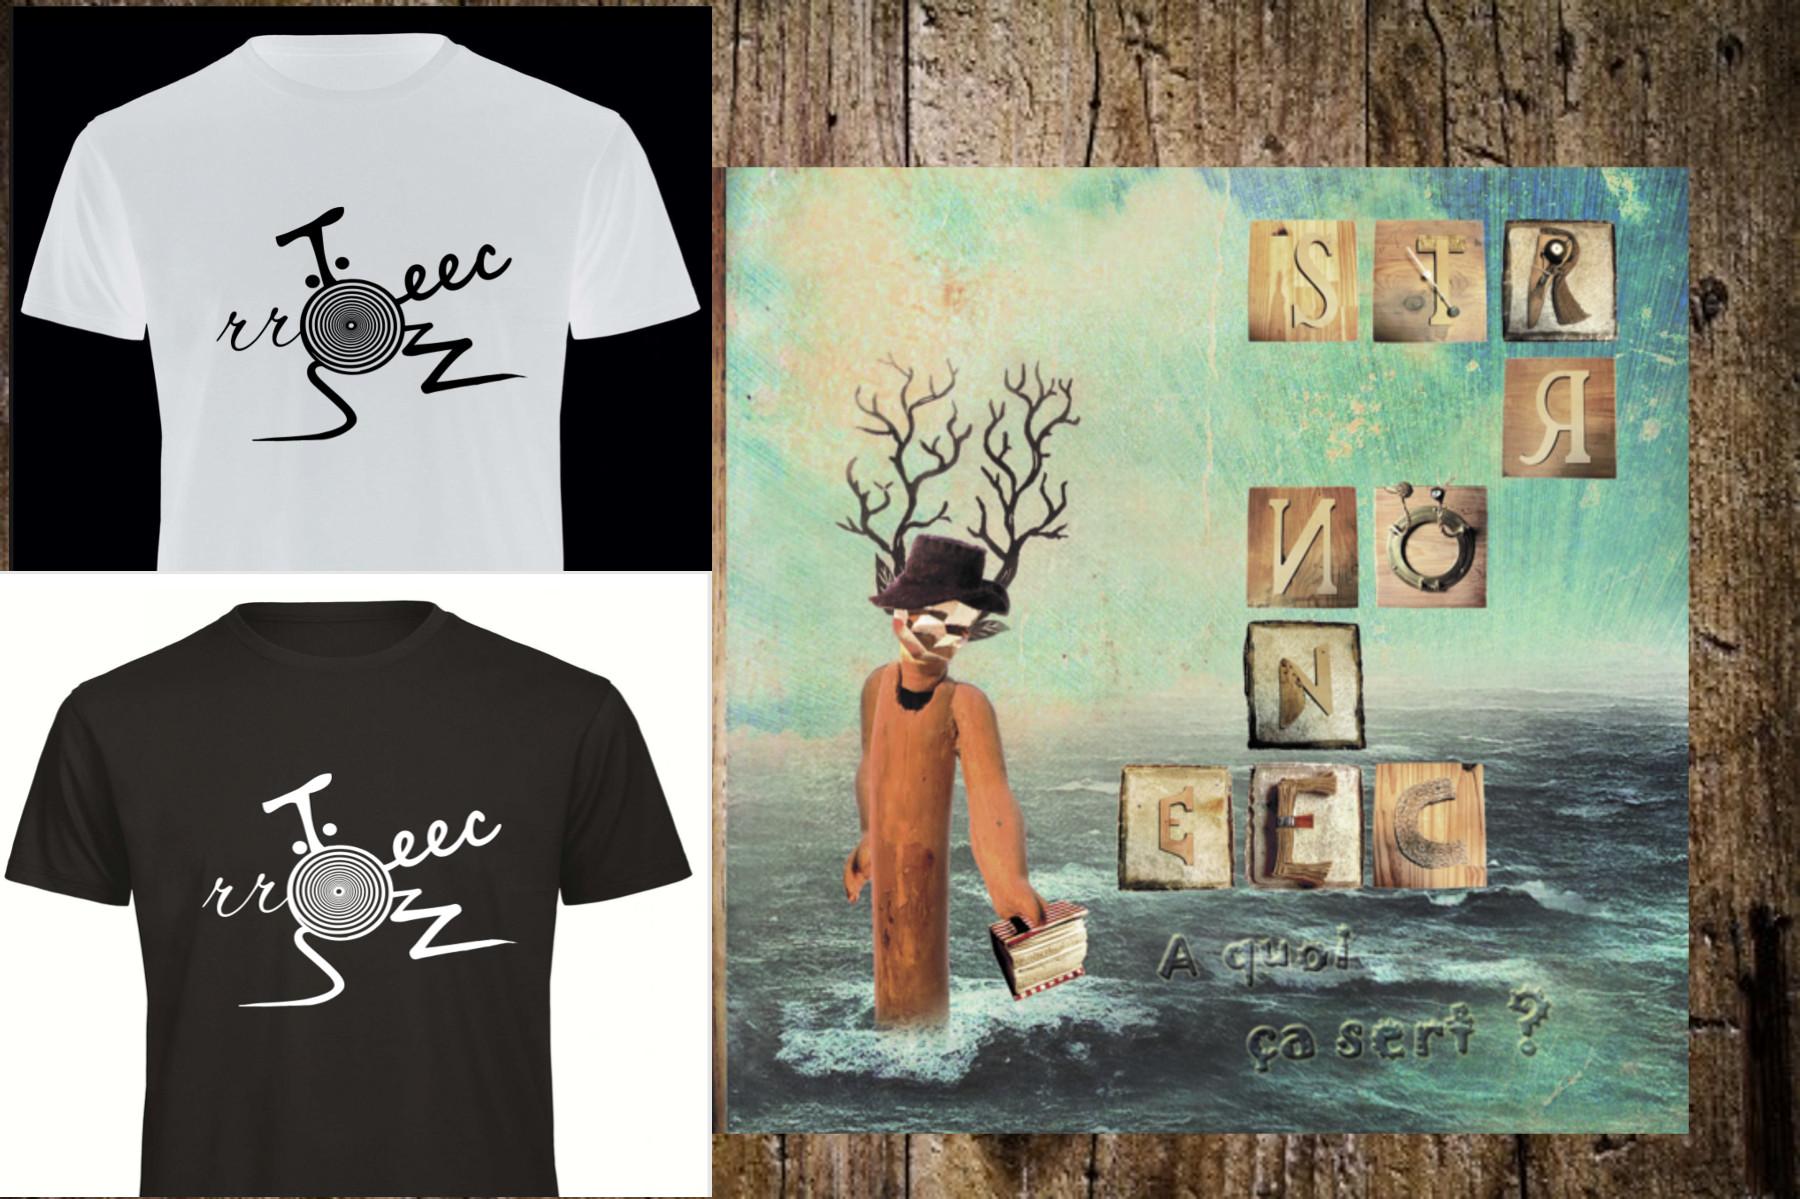 cd+_tee-shirt-1533519006.jpg